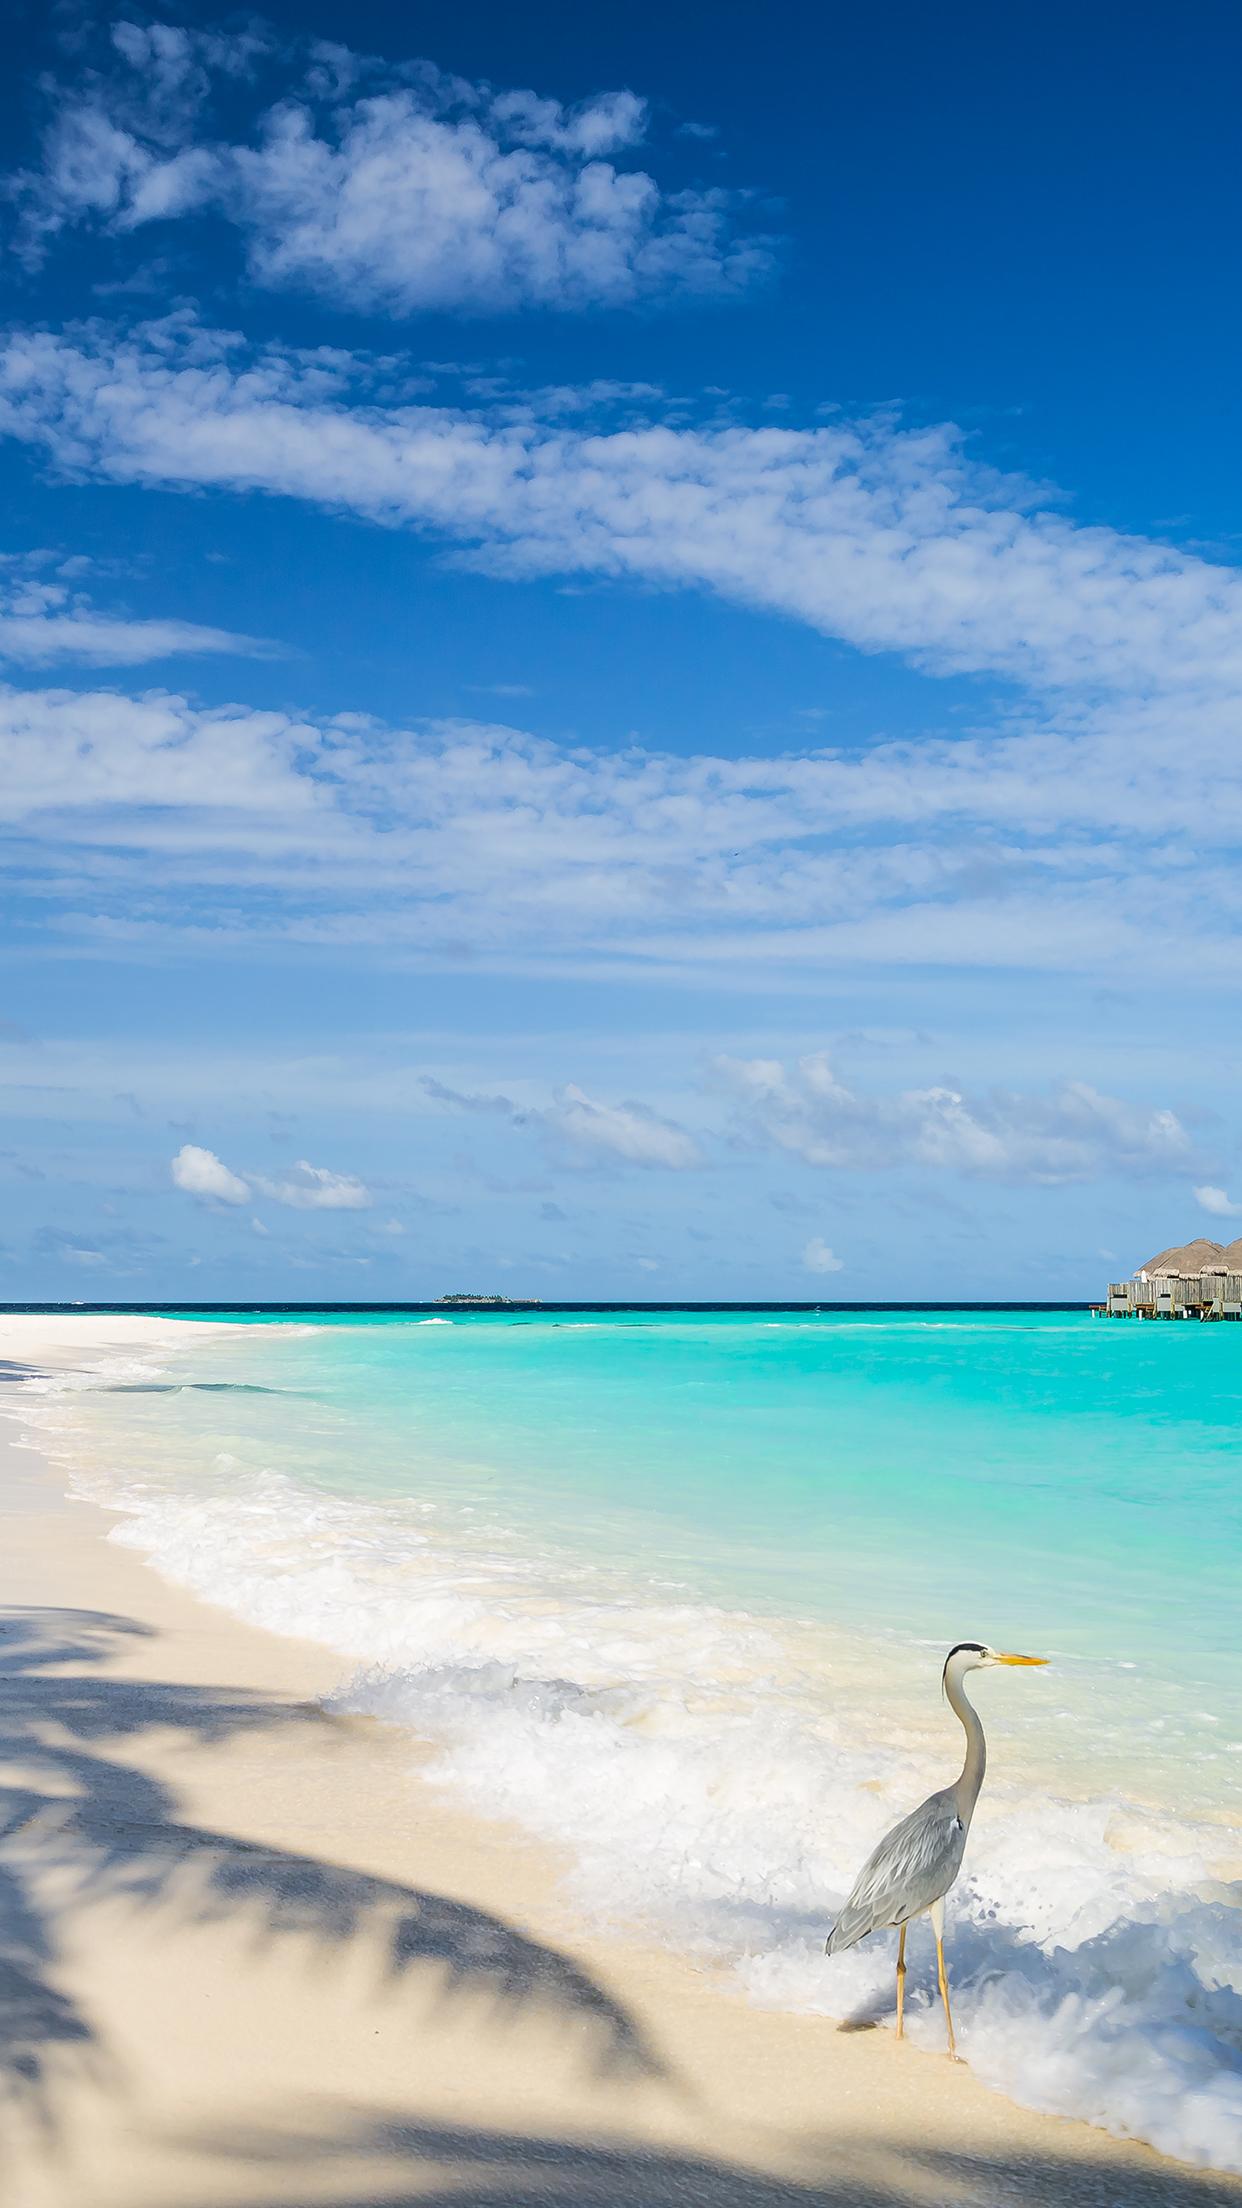 Maldives Beach Wallpaper For Iphone X 8 7 6 Free